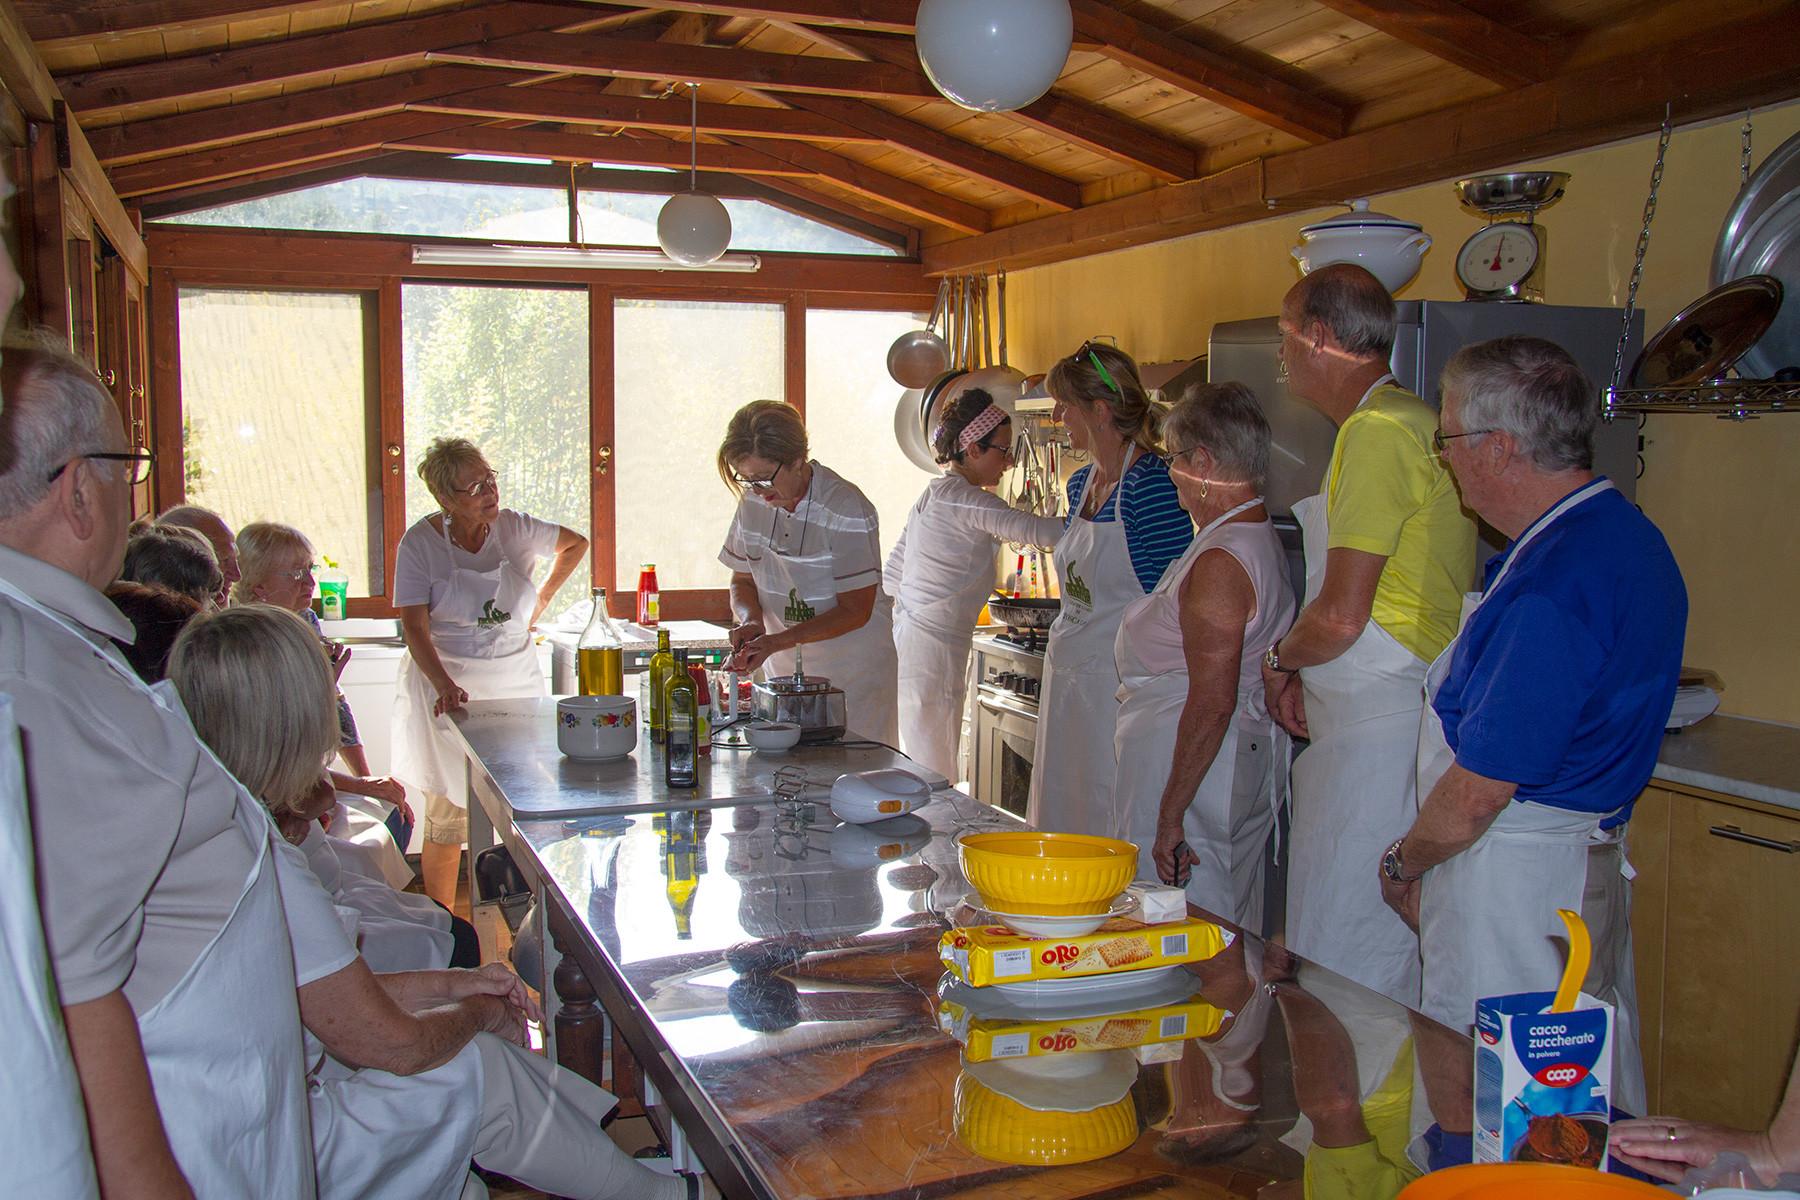 Corsi di cucina tipica toscana in agriturismo a castiglion fiorentino - Corso cucina firenze ...